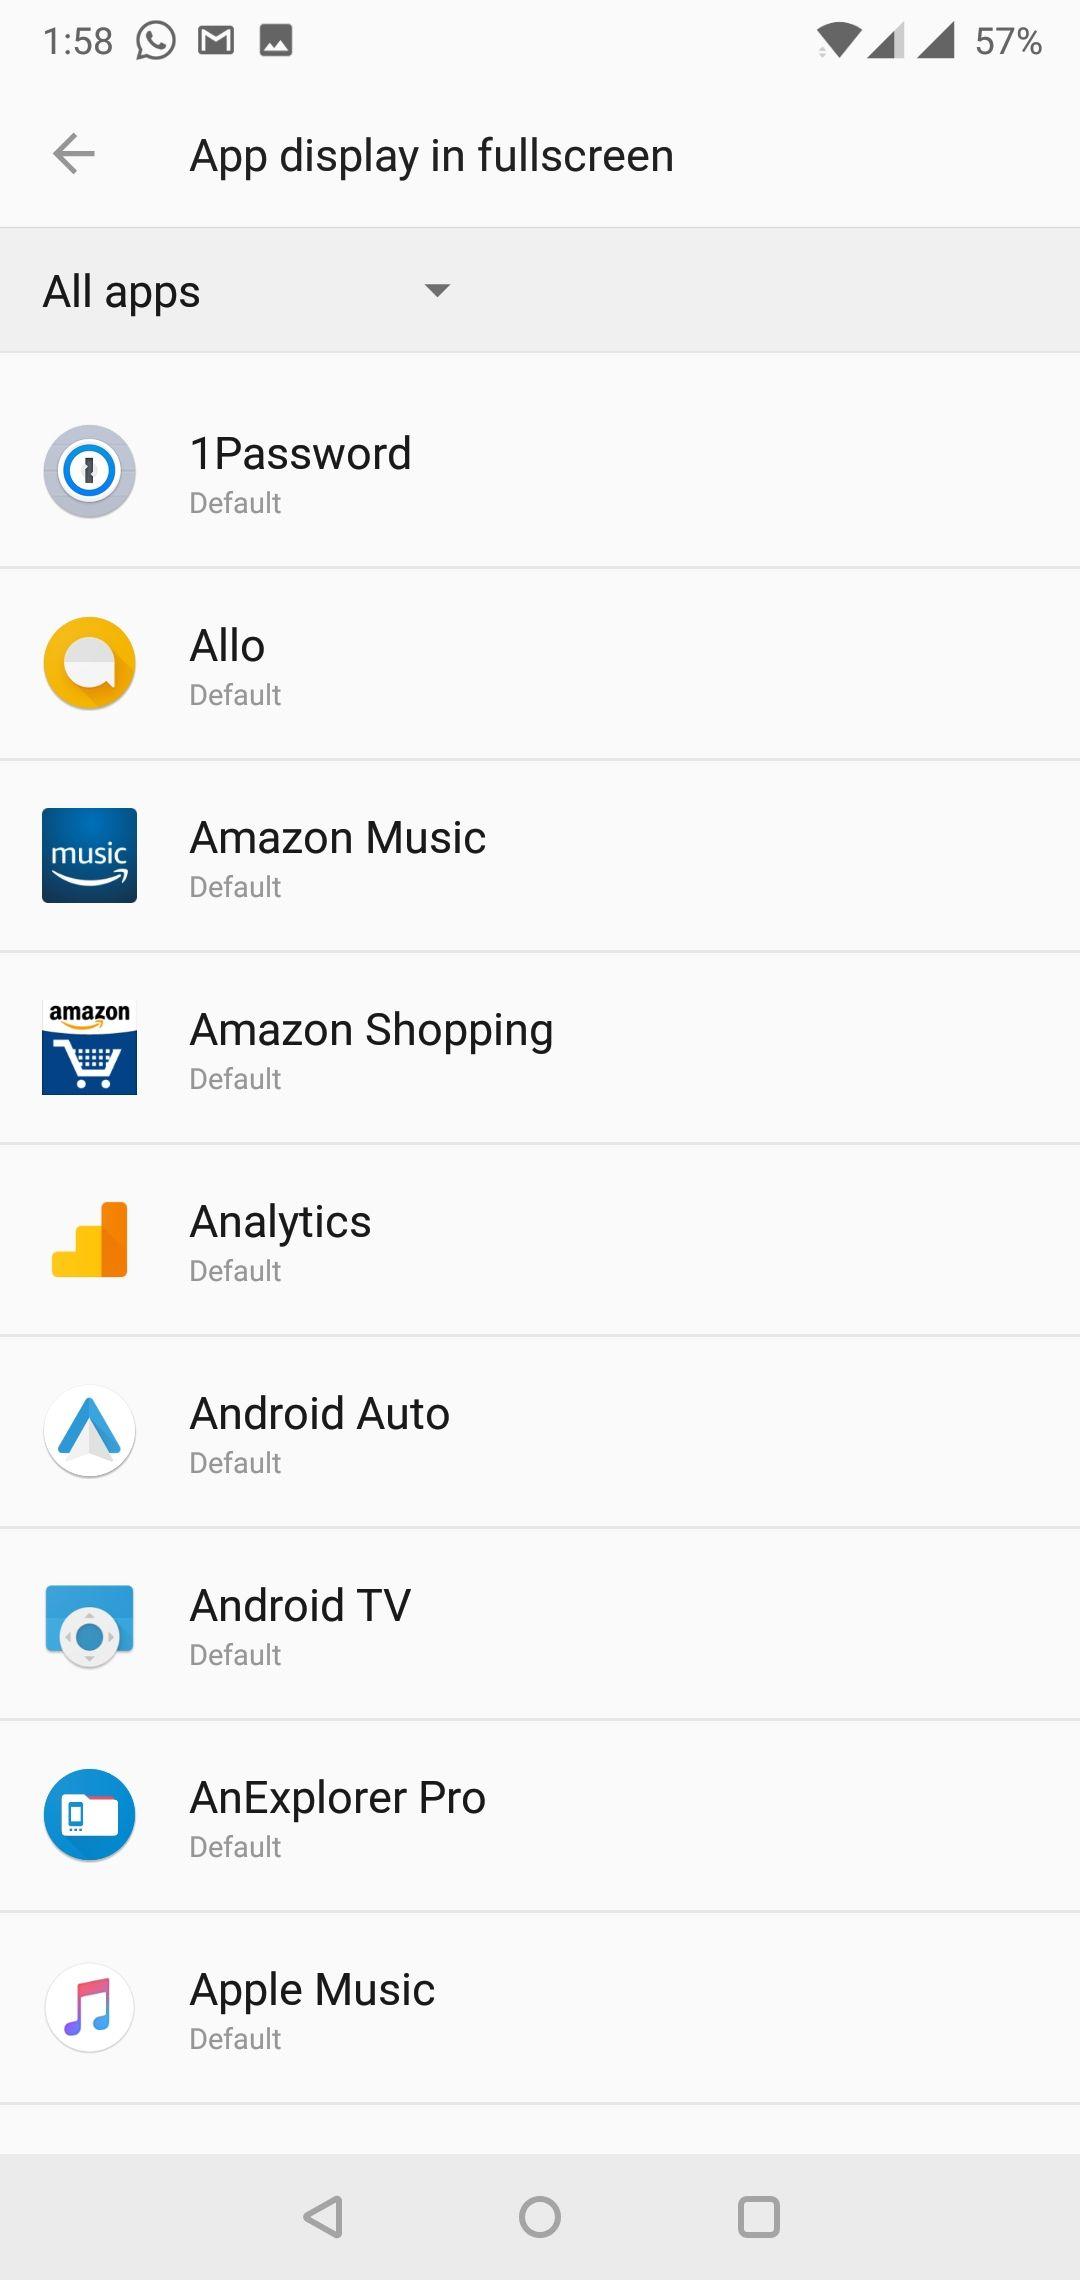 OnePlus 6 App Fullscreen Settings